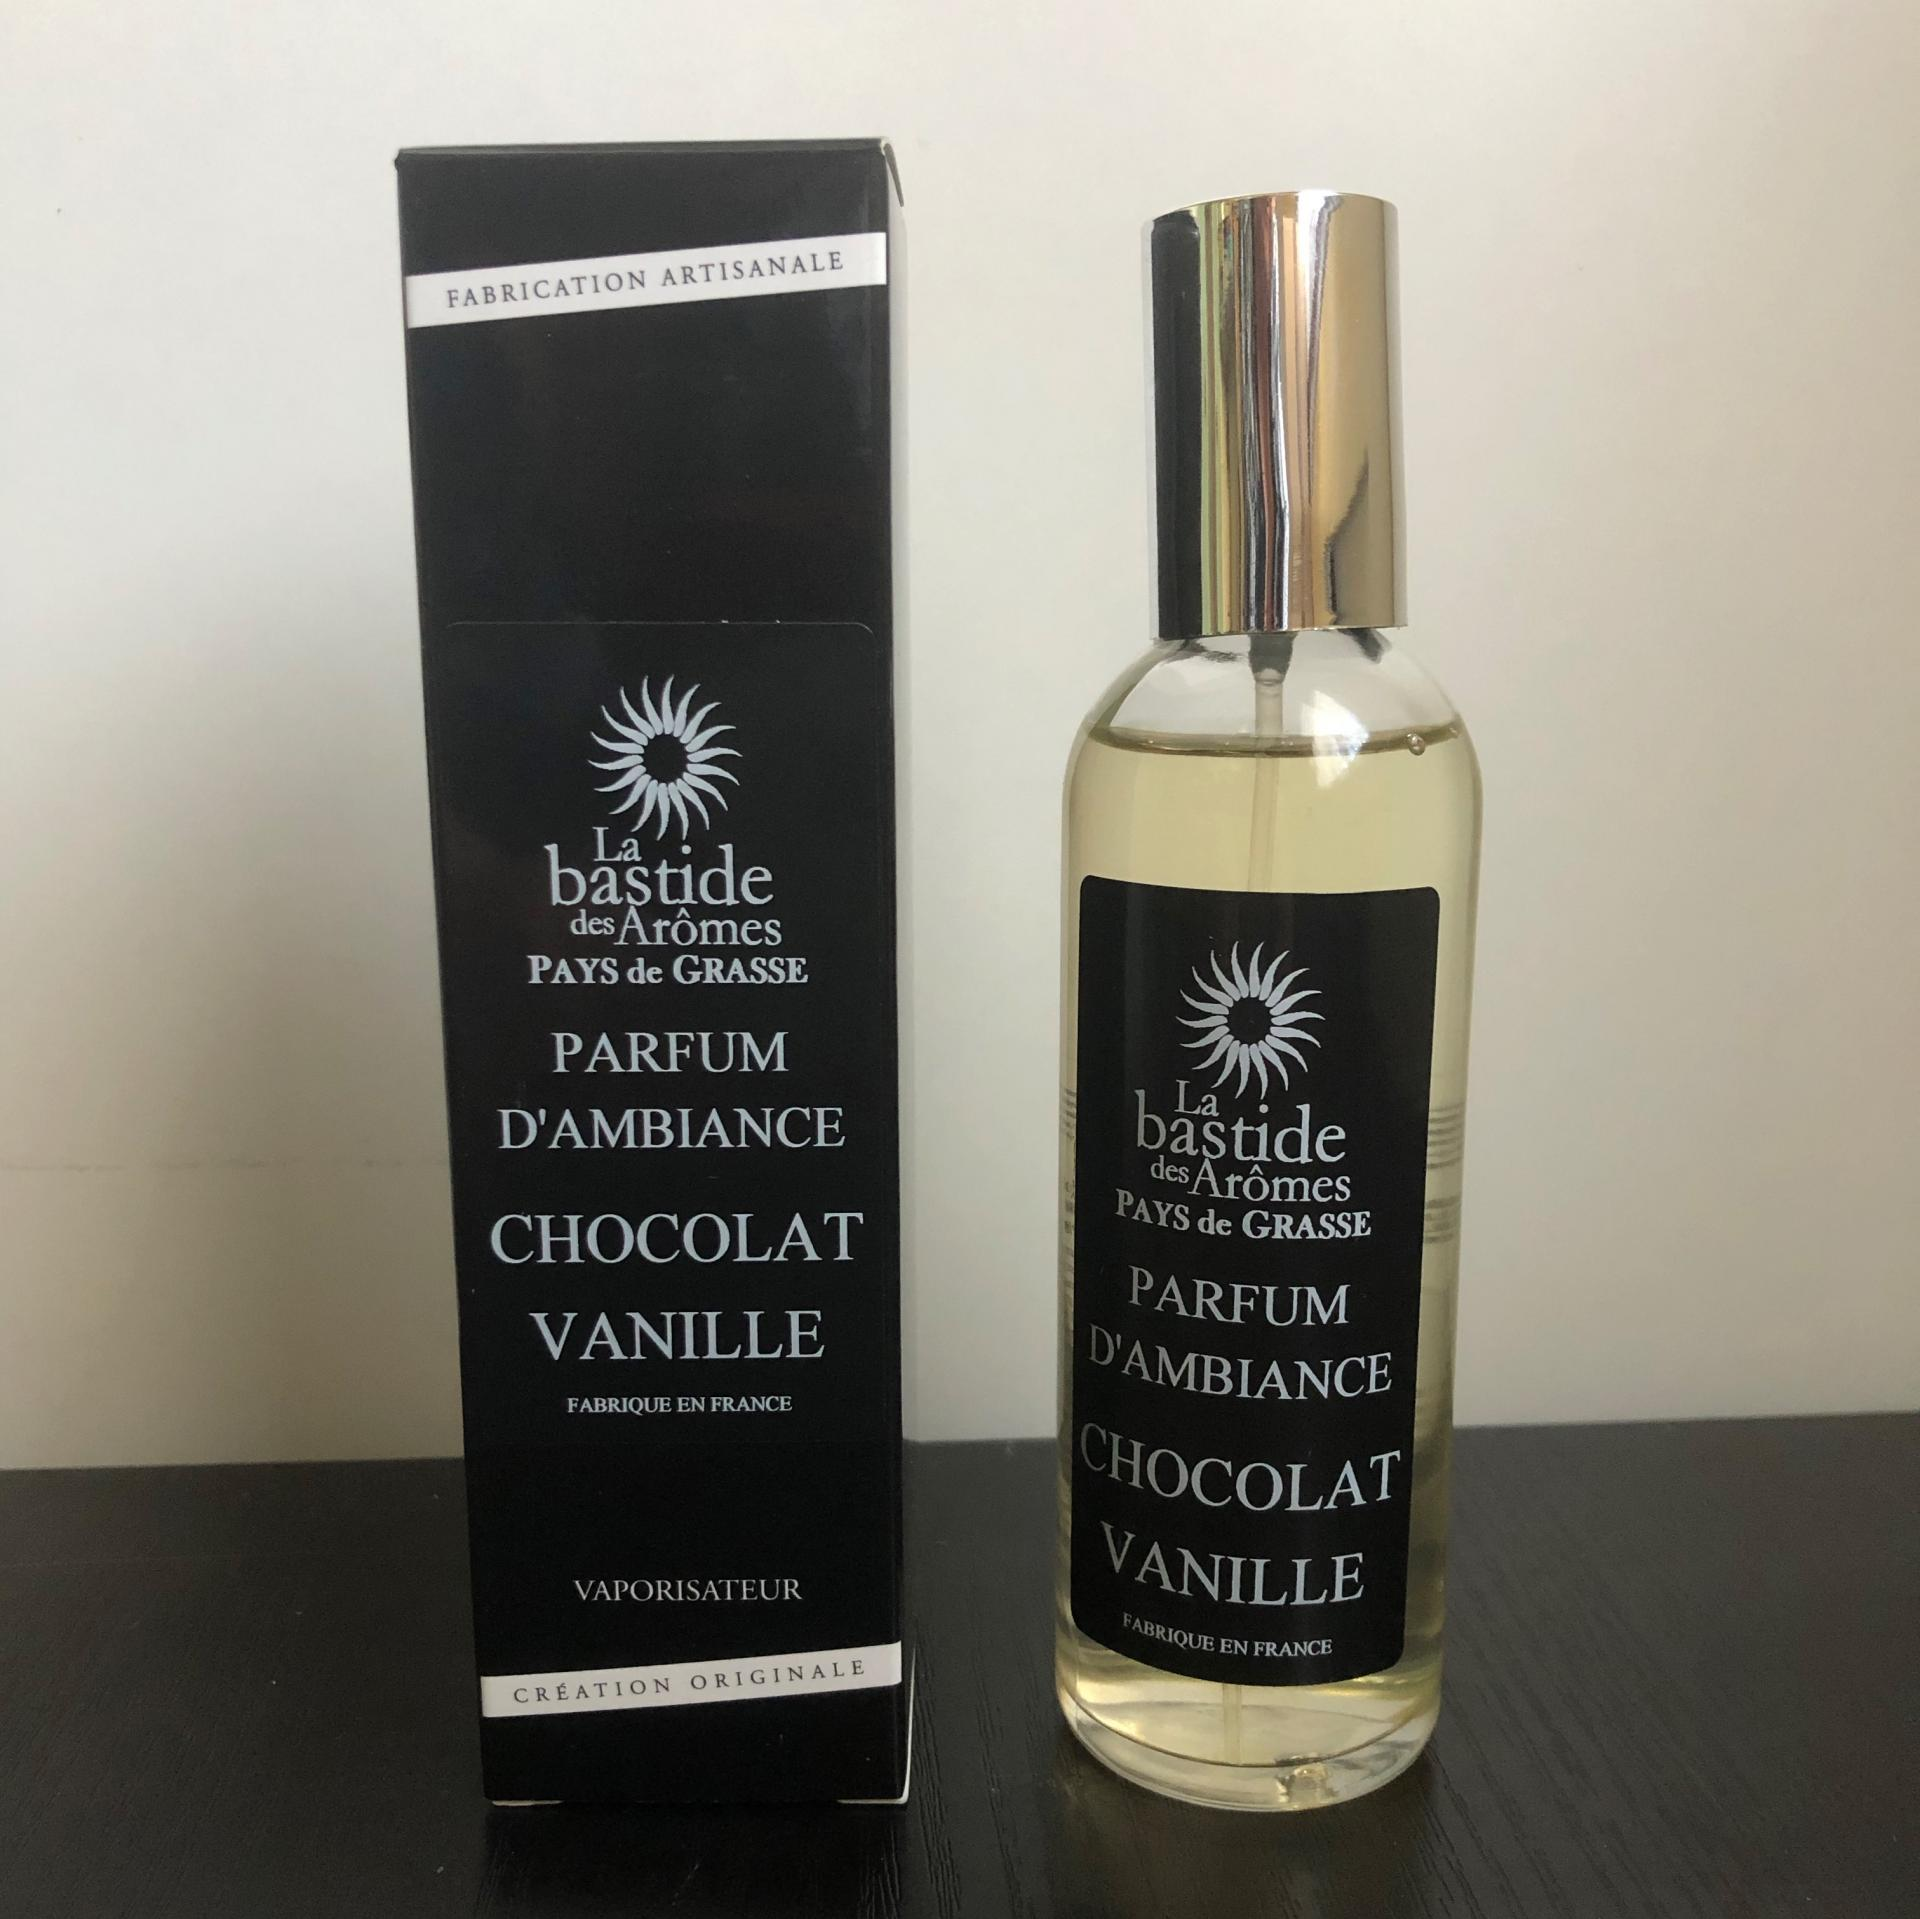 Parfum d ambiance chocolat vanille